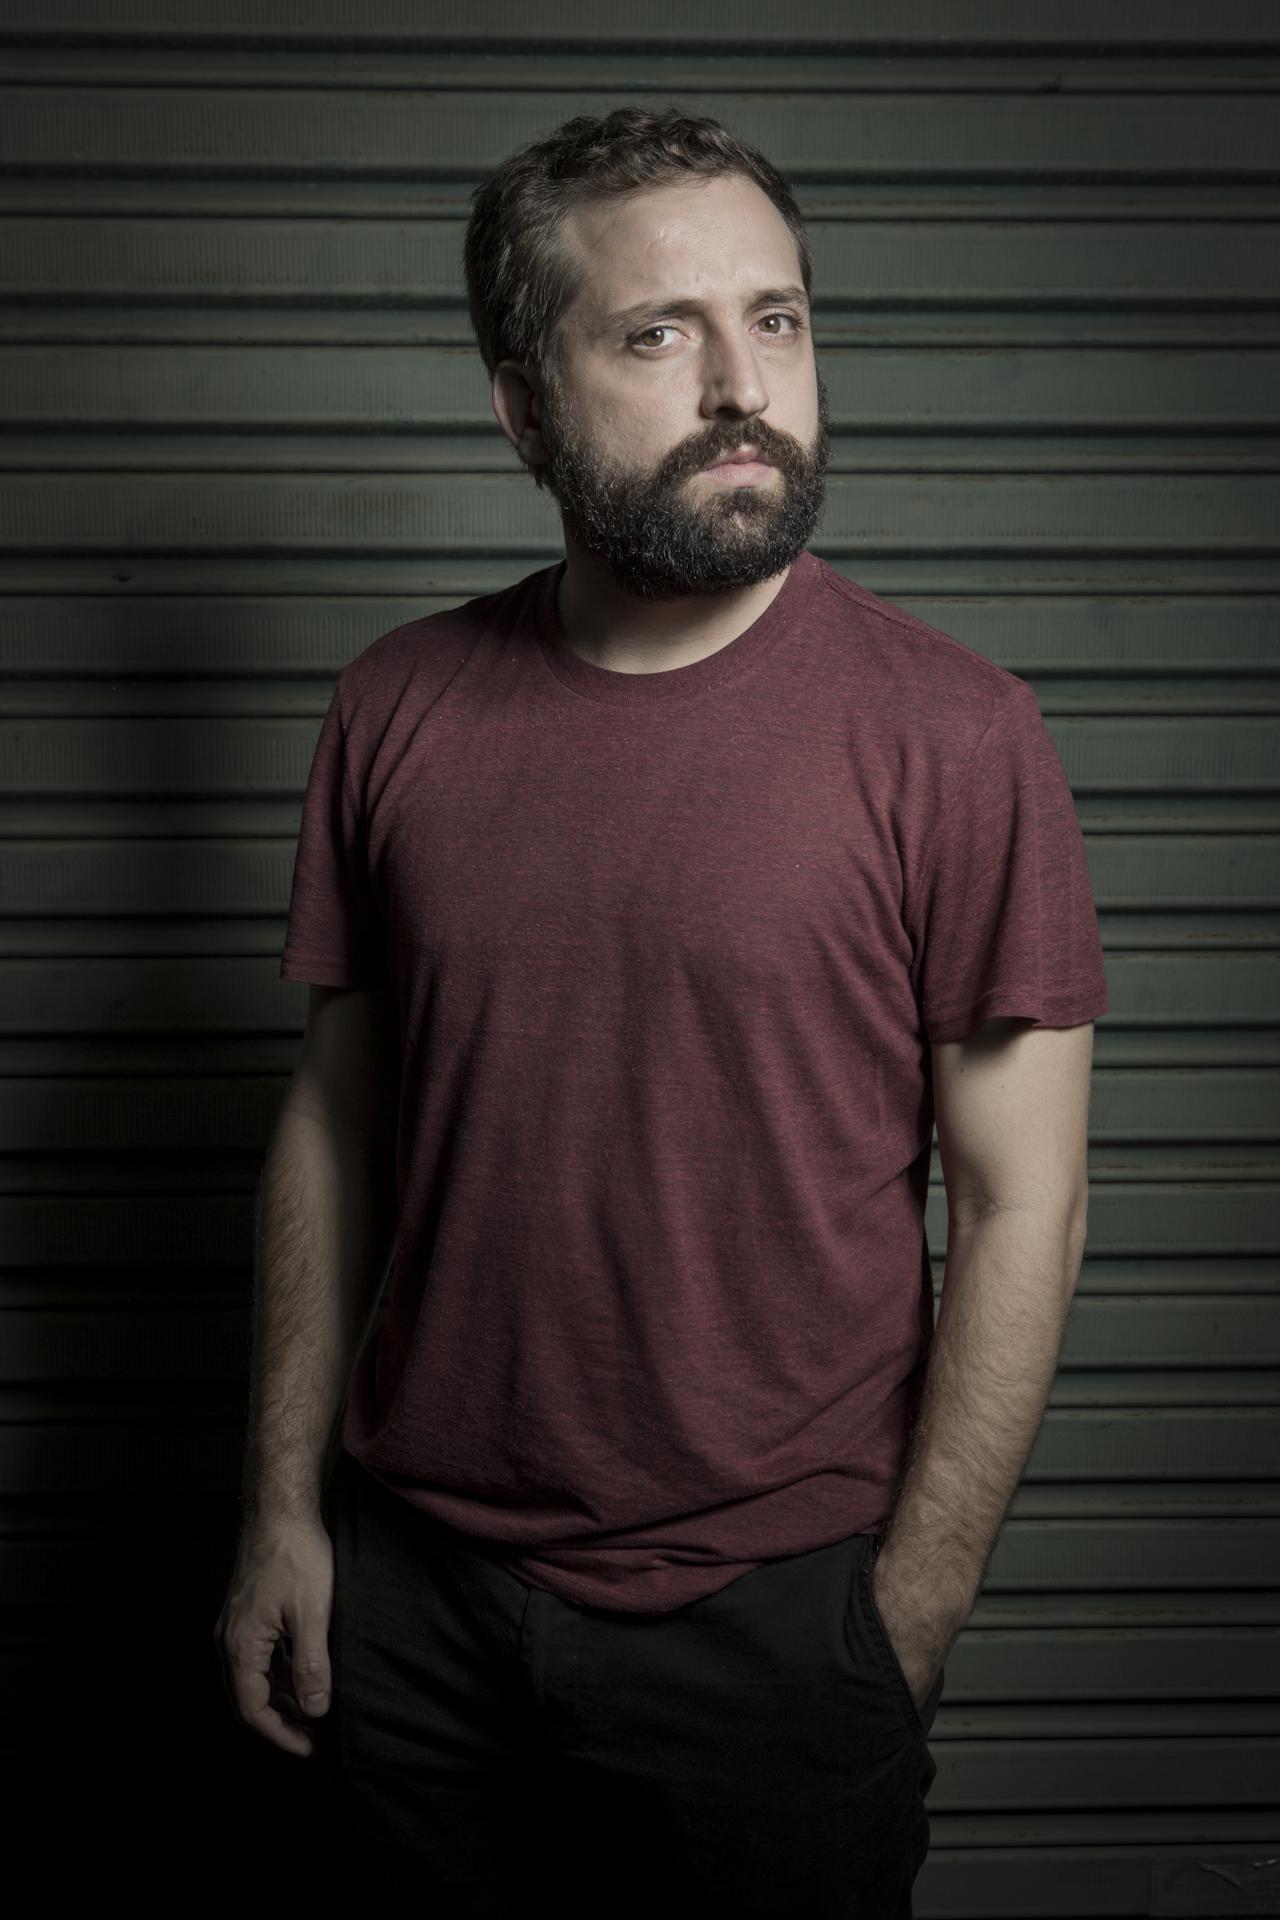 Gregório Duvivier, comedian and writer